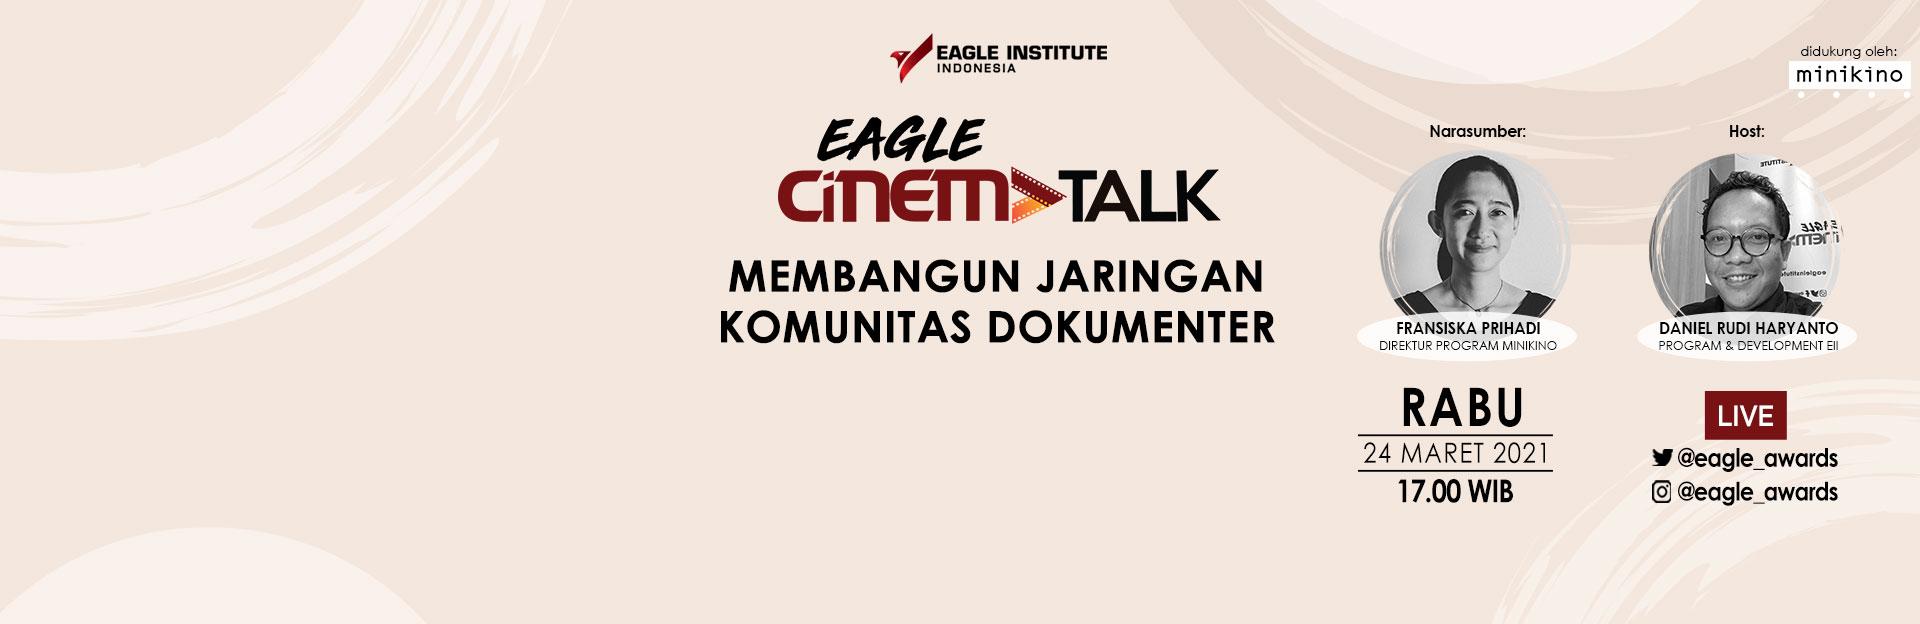 Eagle Cinema Talk